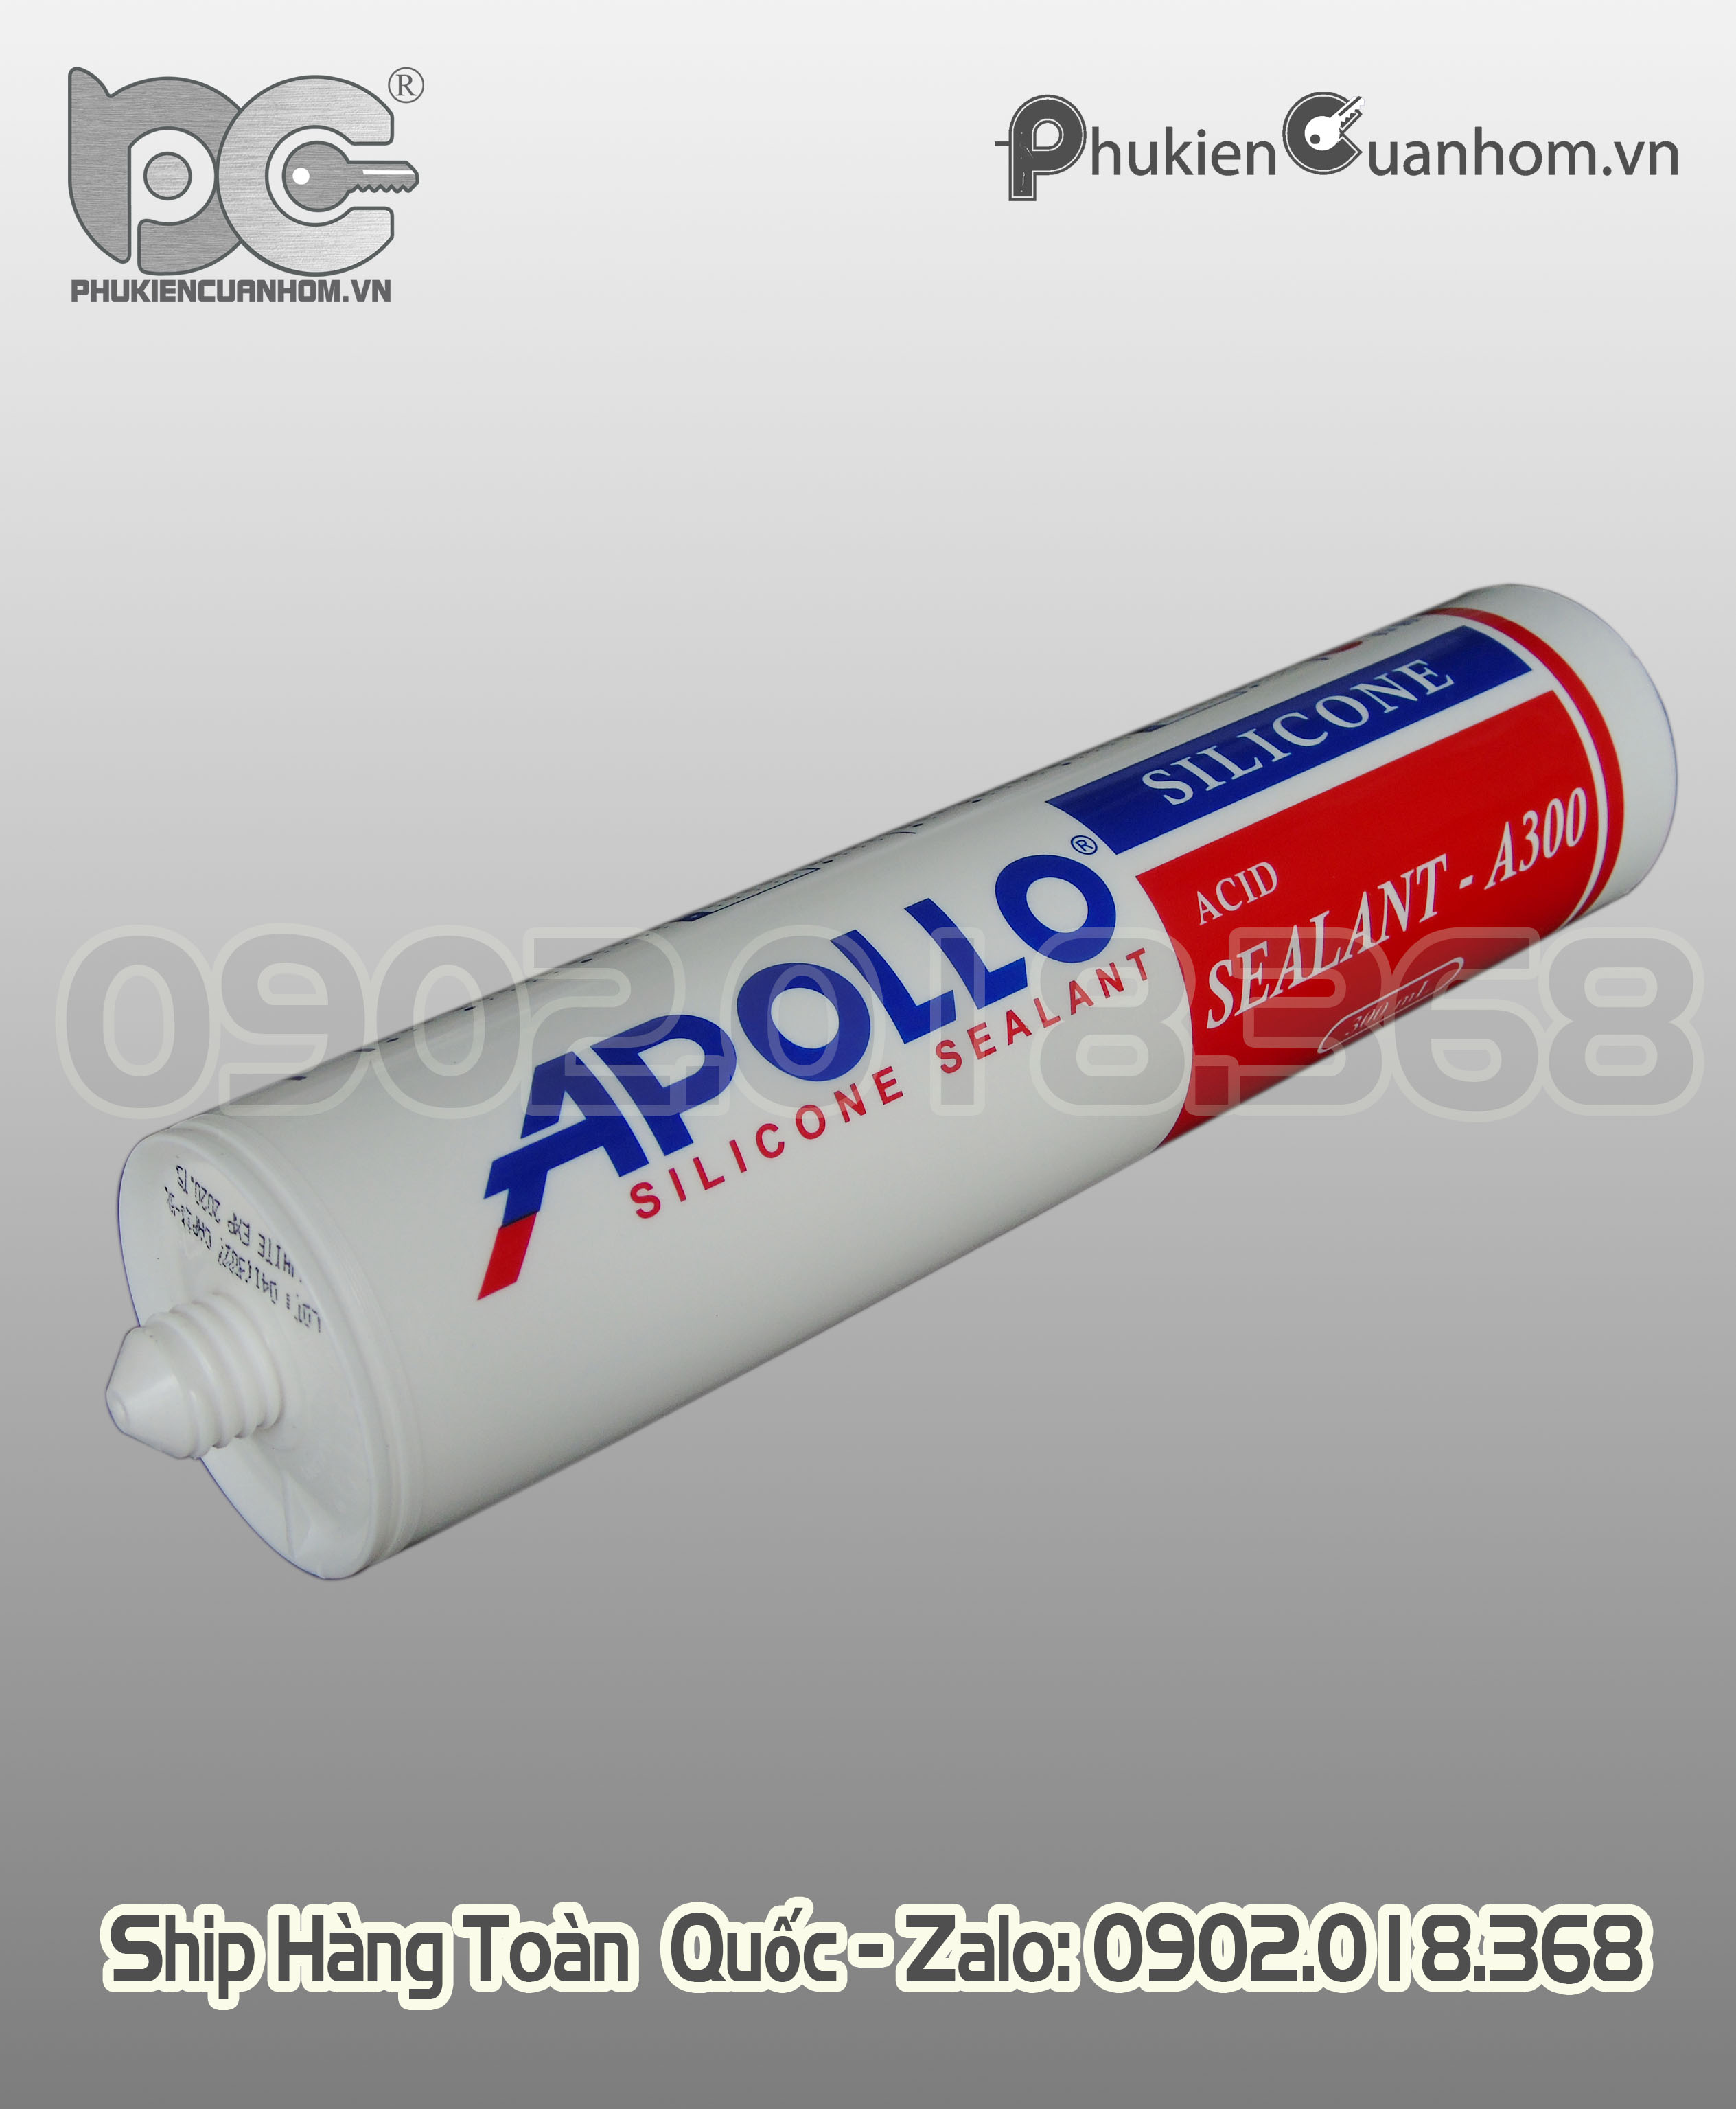 Keo Apollo A300 màu trắng sữa